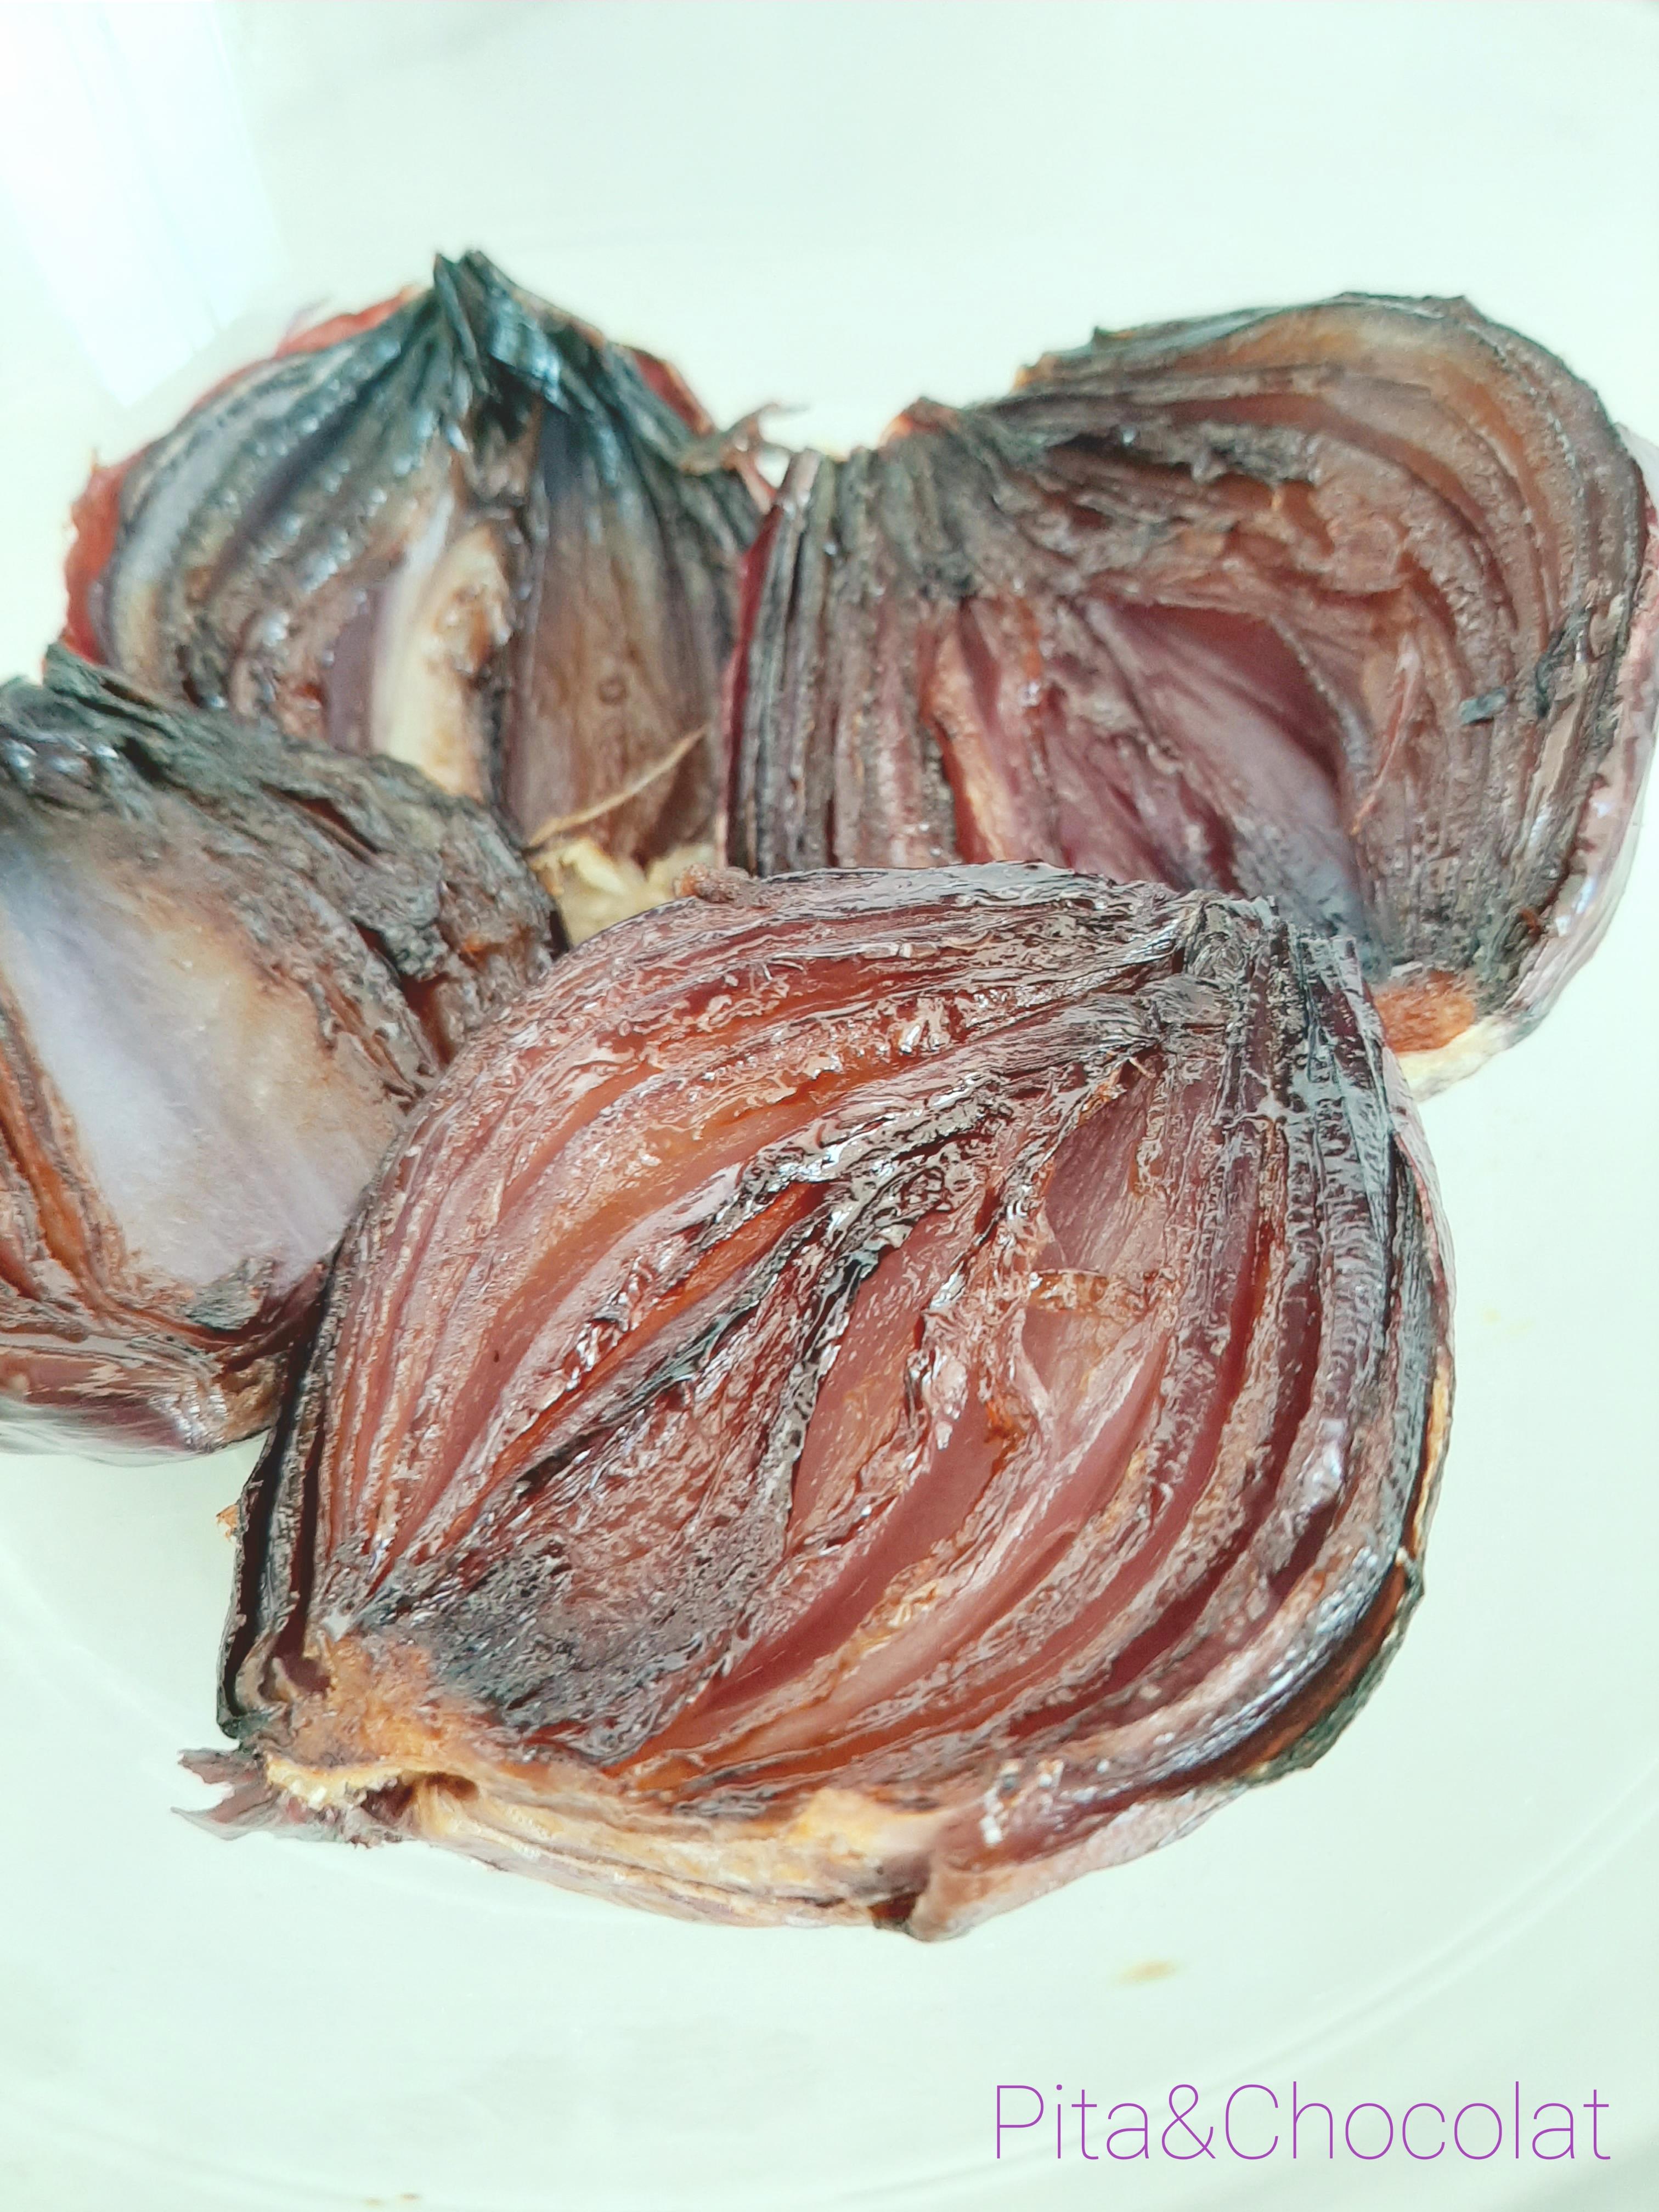 Oignons rôtis au four